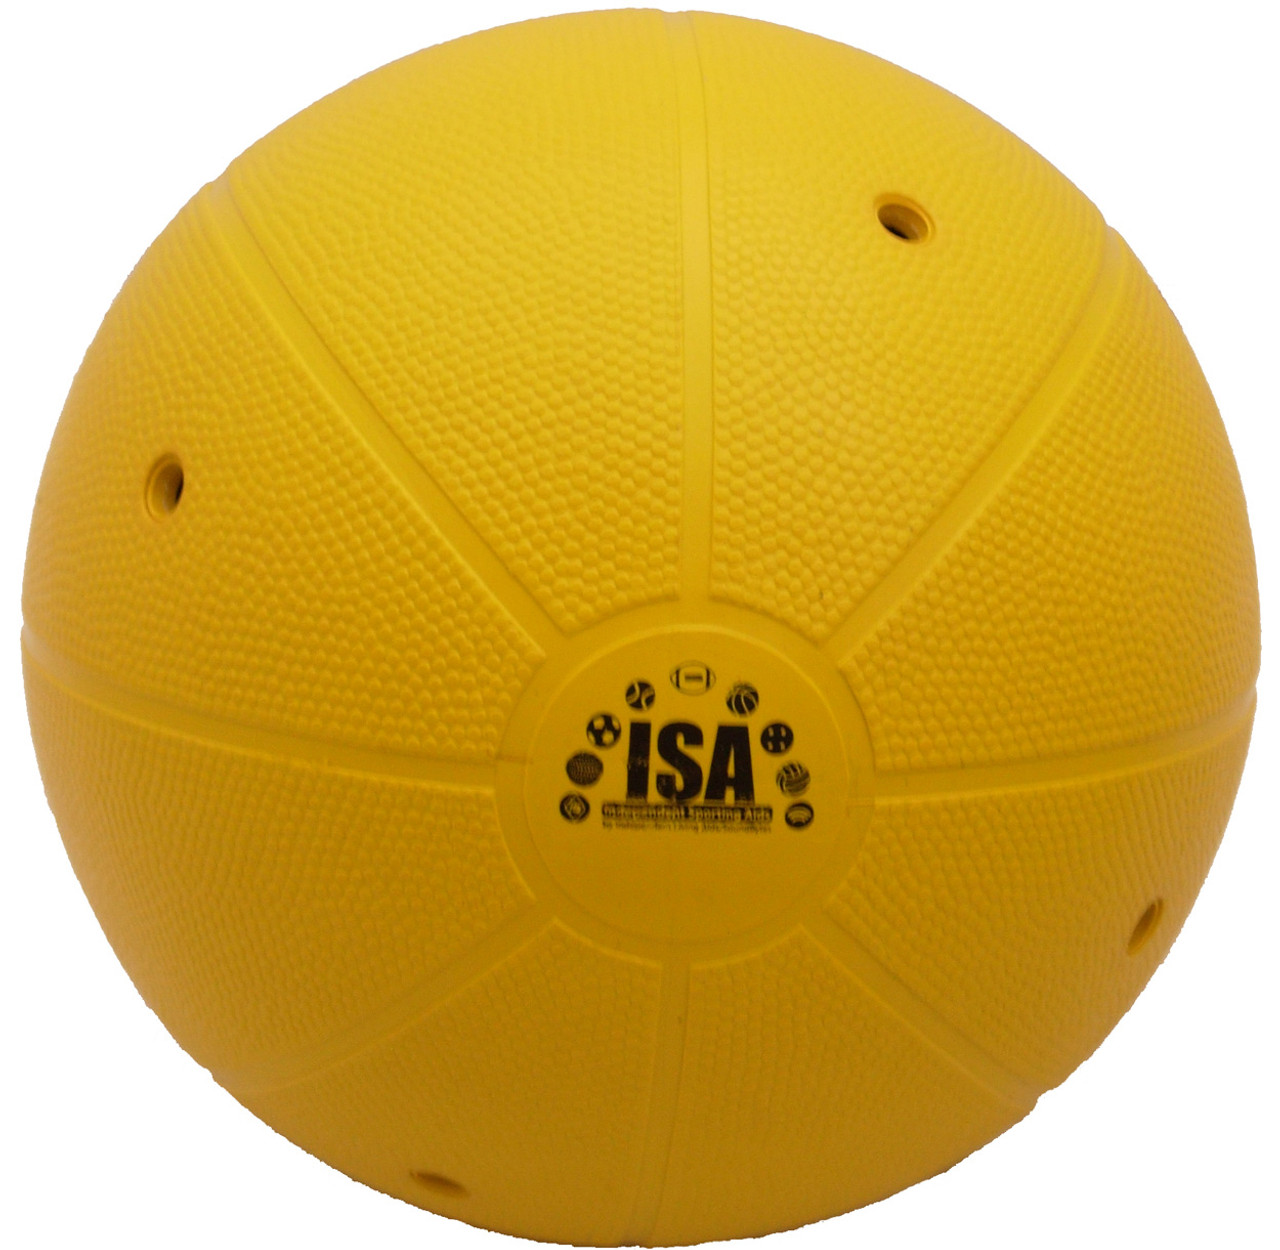 ISA Goalball